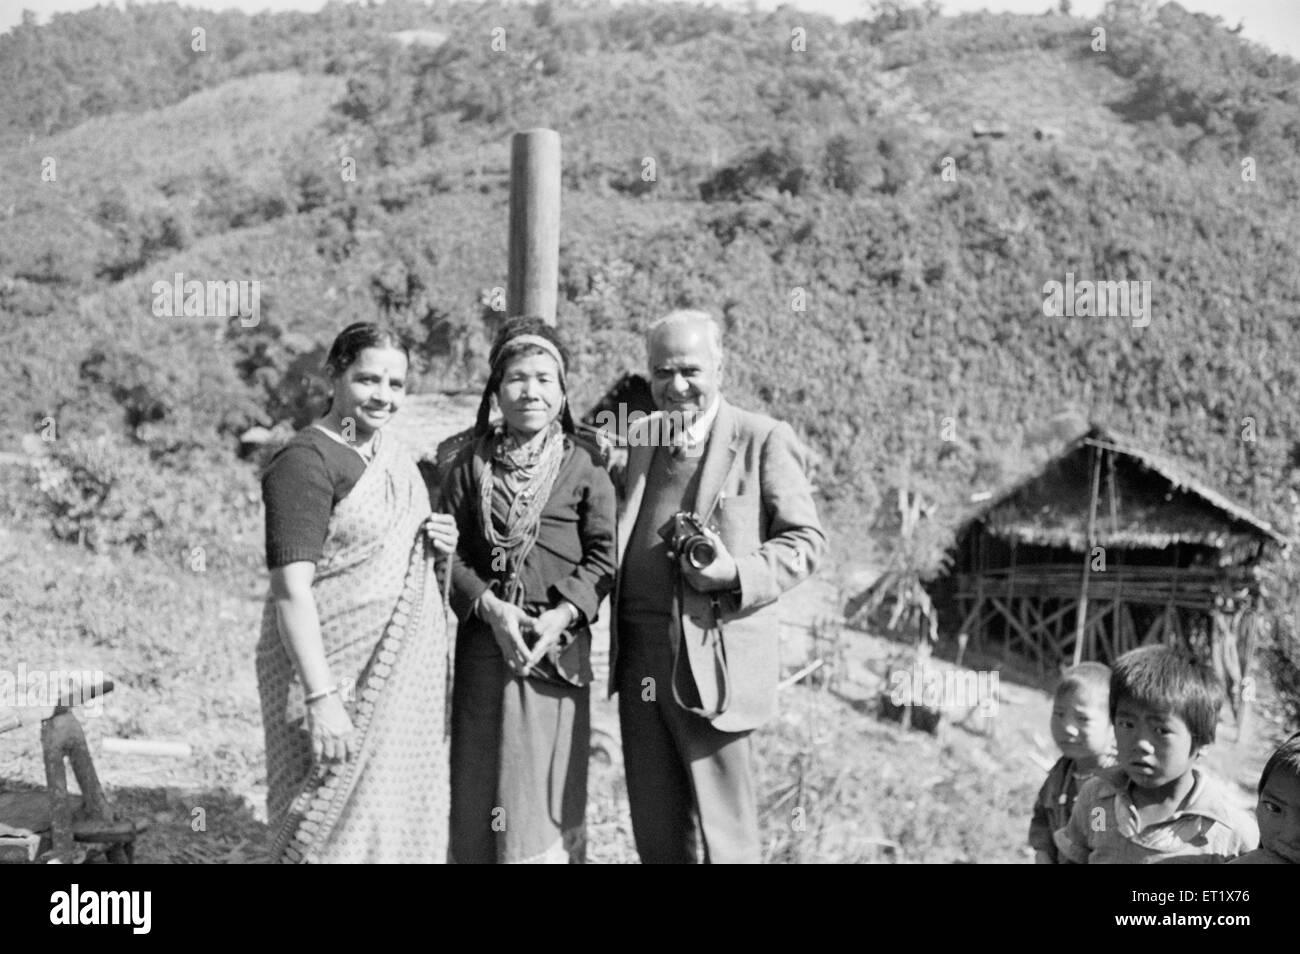 Mr and Mrs. TS. Satyan with Hill Miri tribal lady ; Arunachal Pradesh ; India NO MR - Stock Image